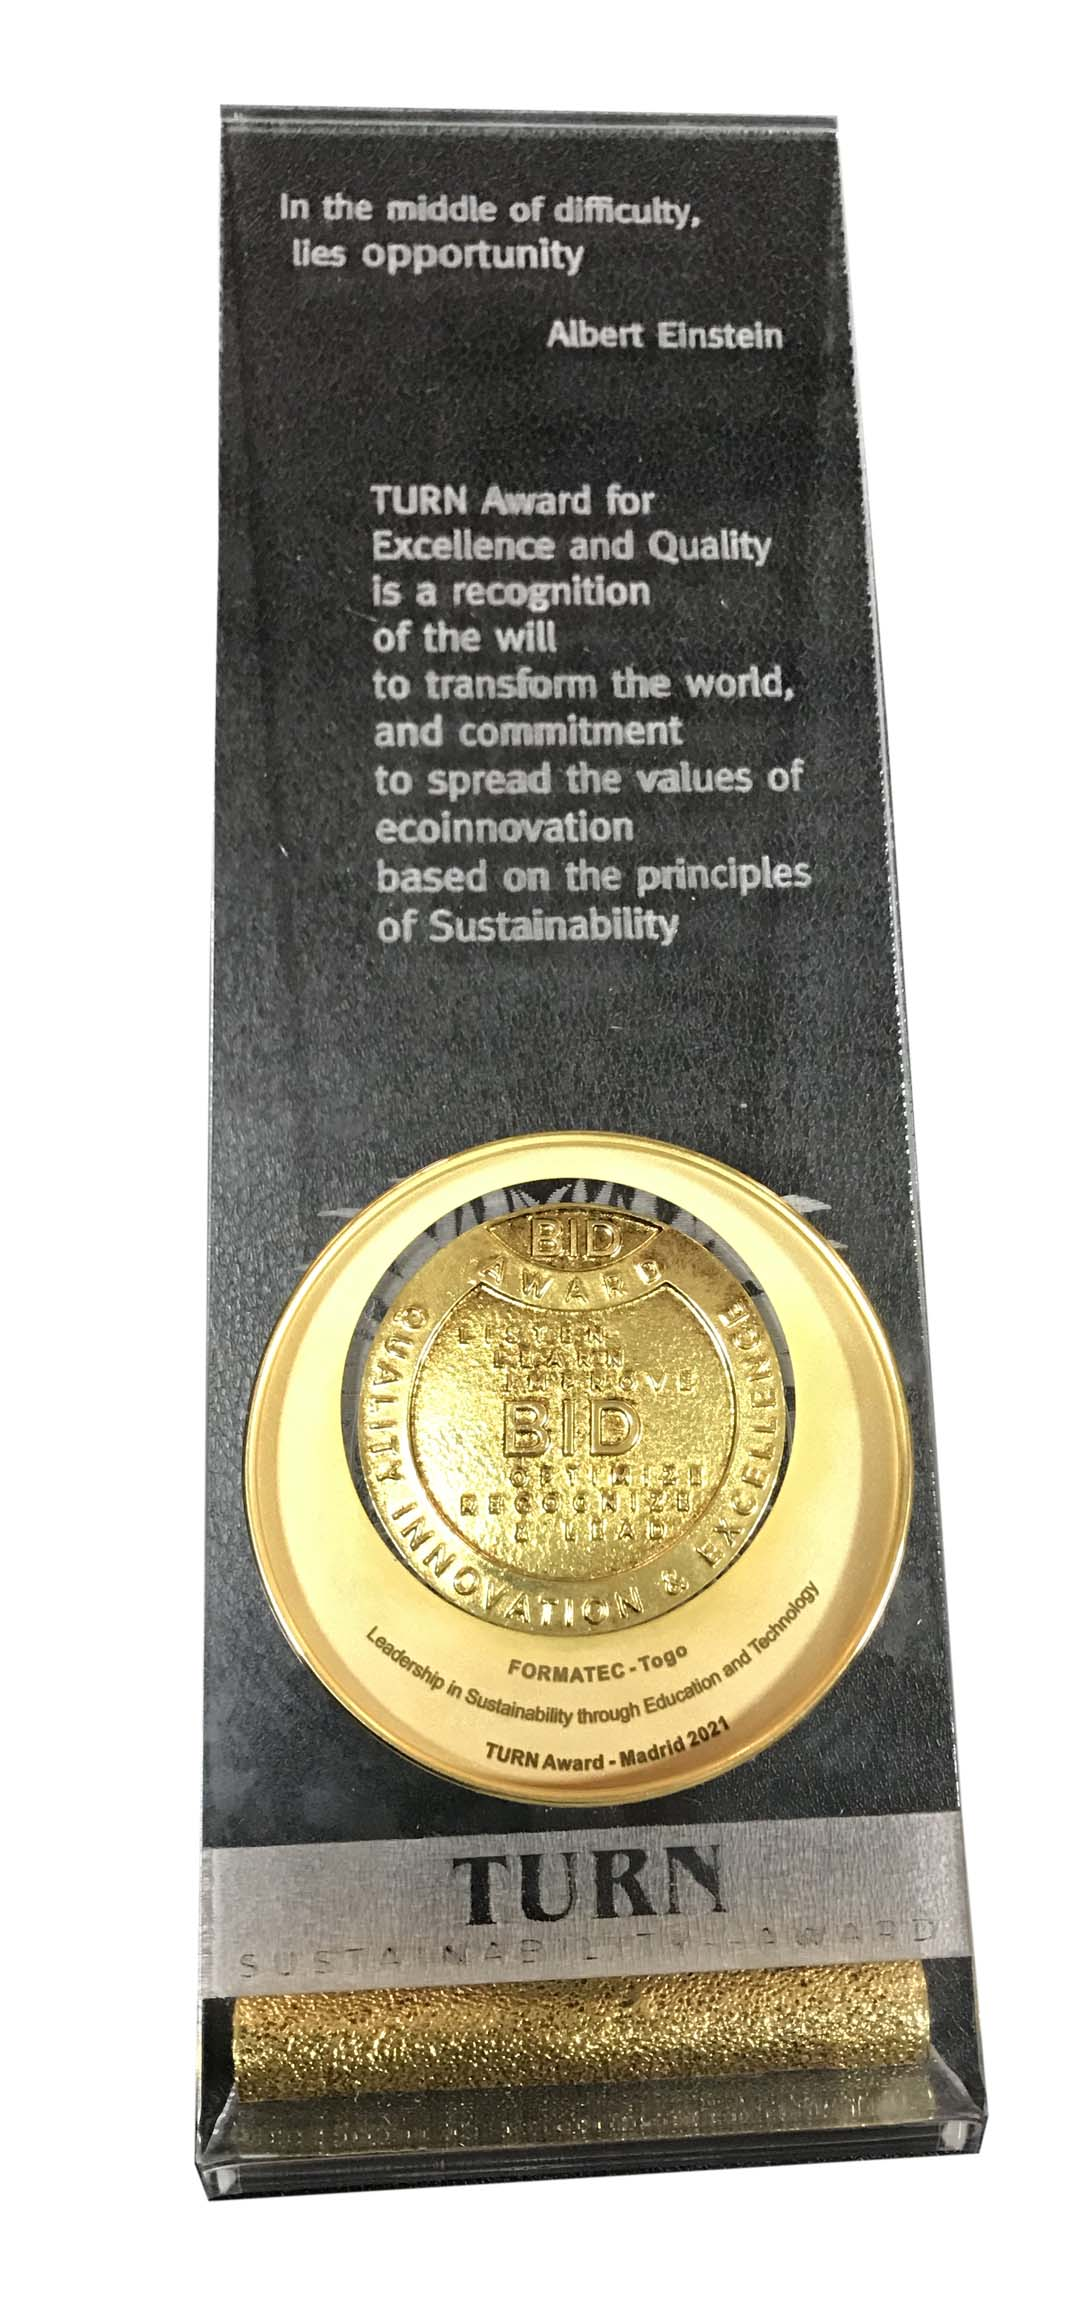 International Turn Award for Sustainability.